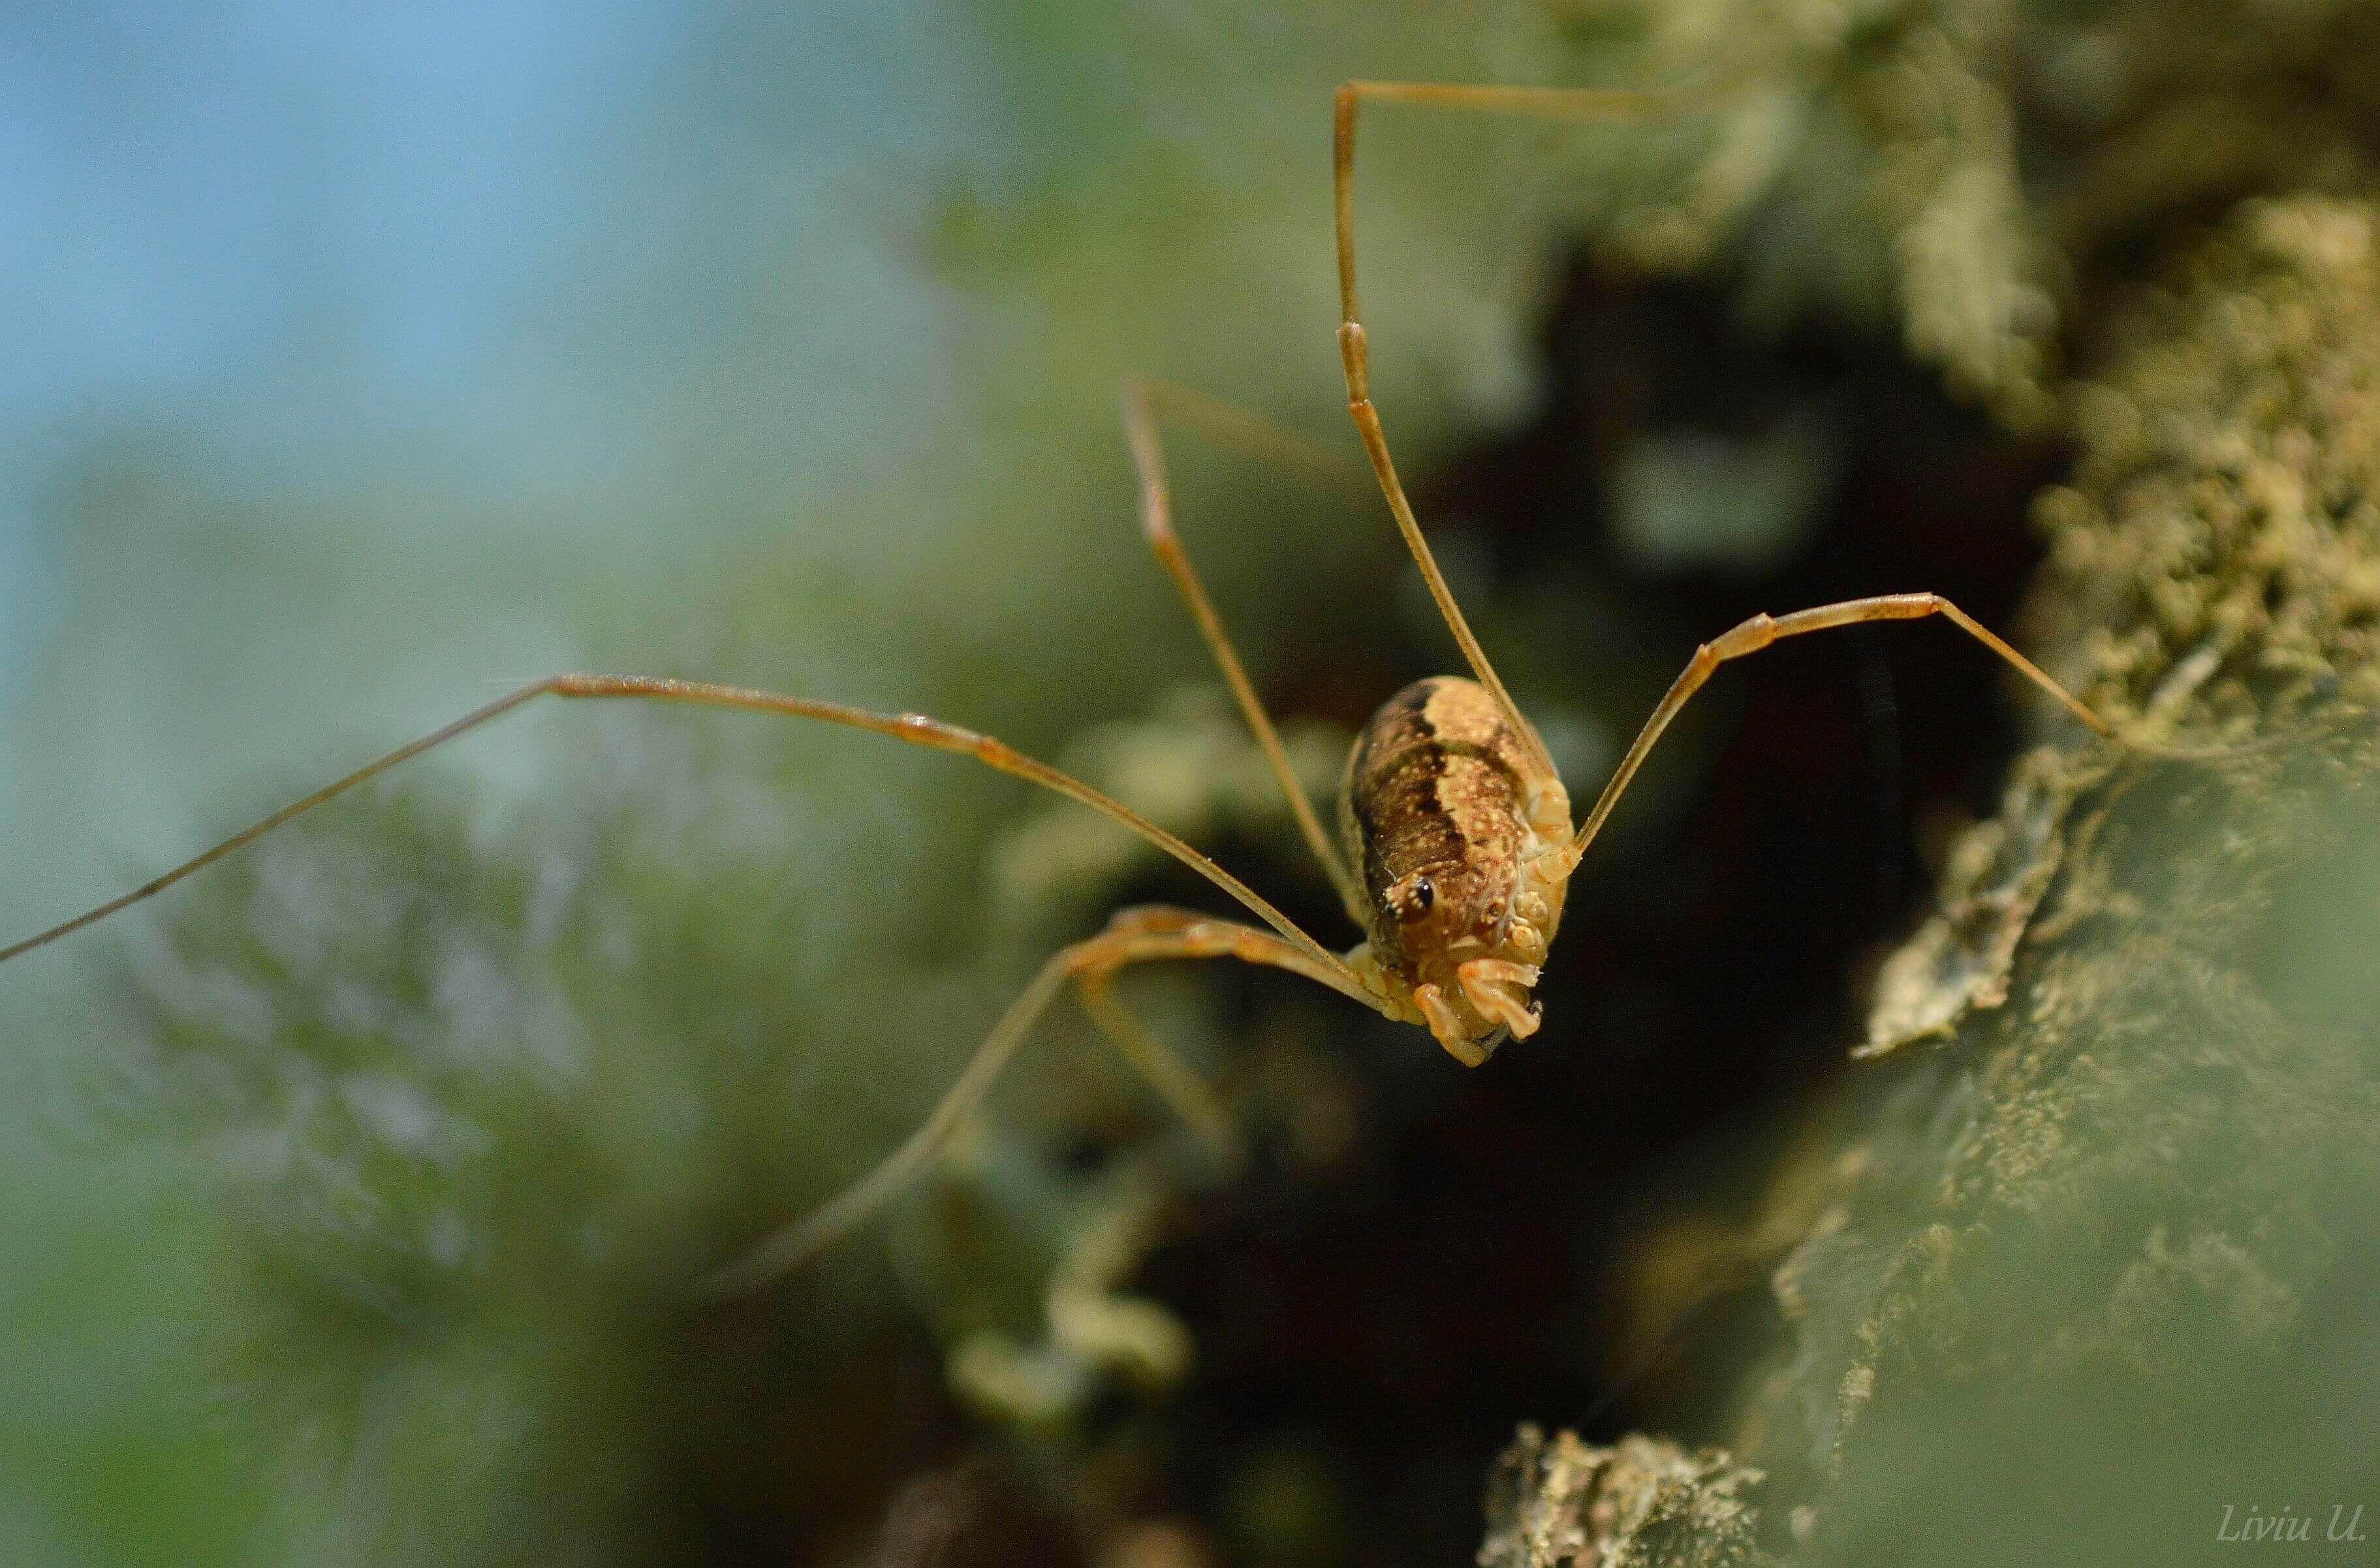 Phalangium opillio, spider, paianjen, Dumbrava Vadului, Sercaia, Vad